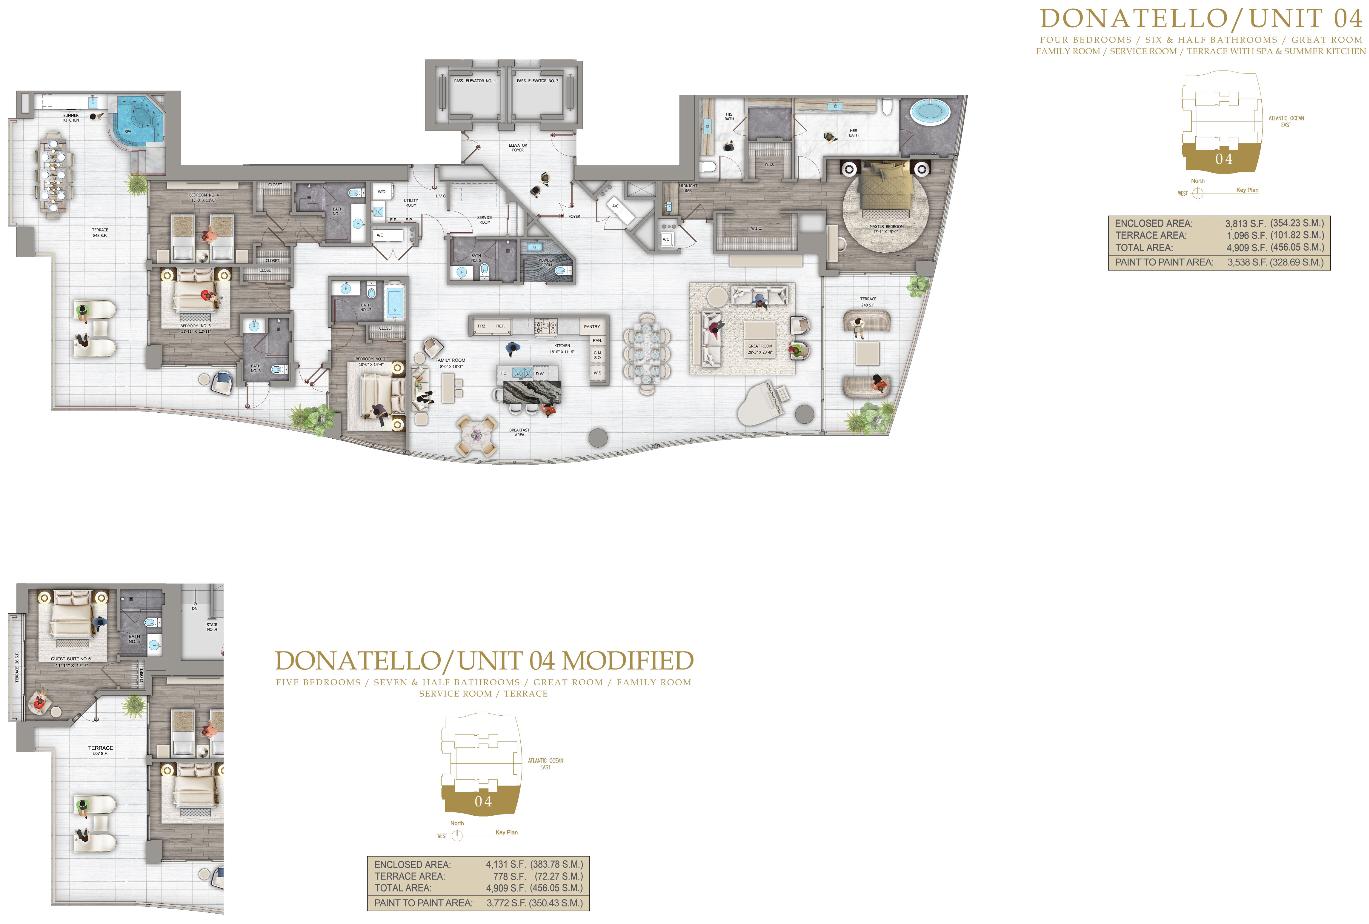 Donatello_Floor_Plan.png